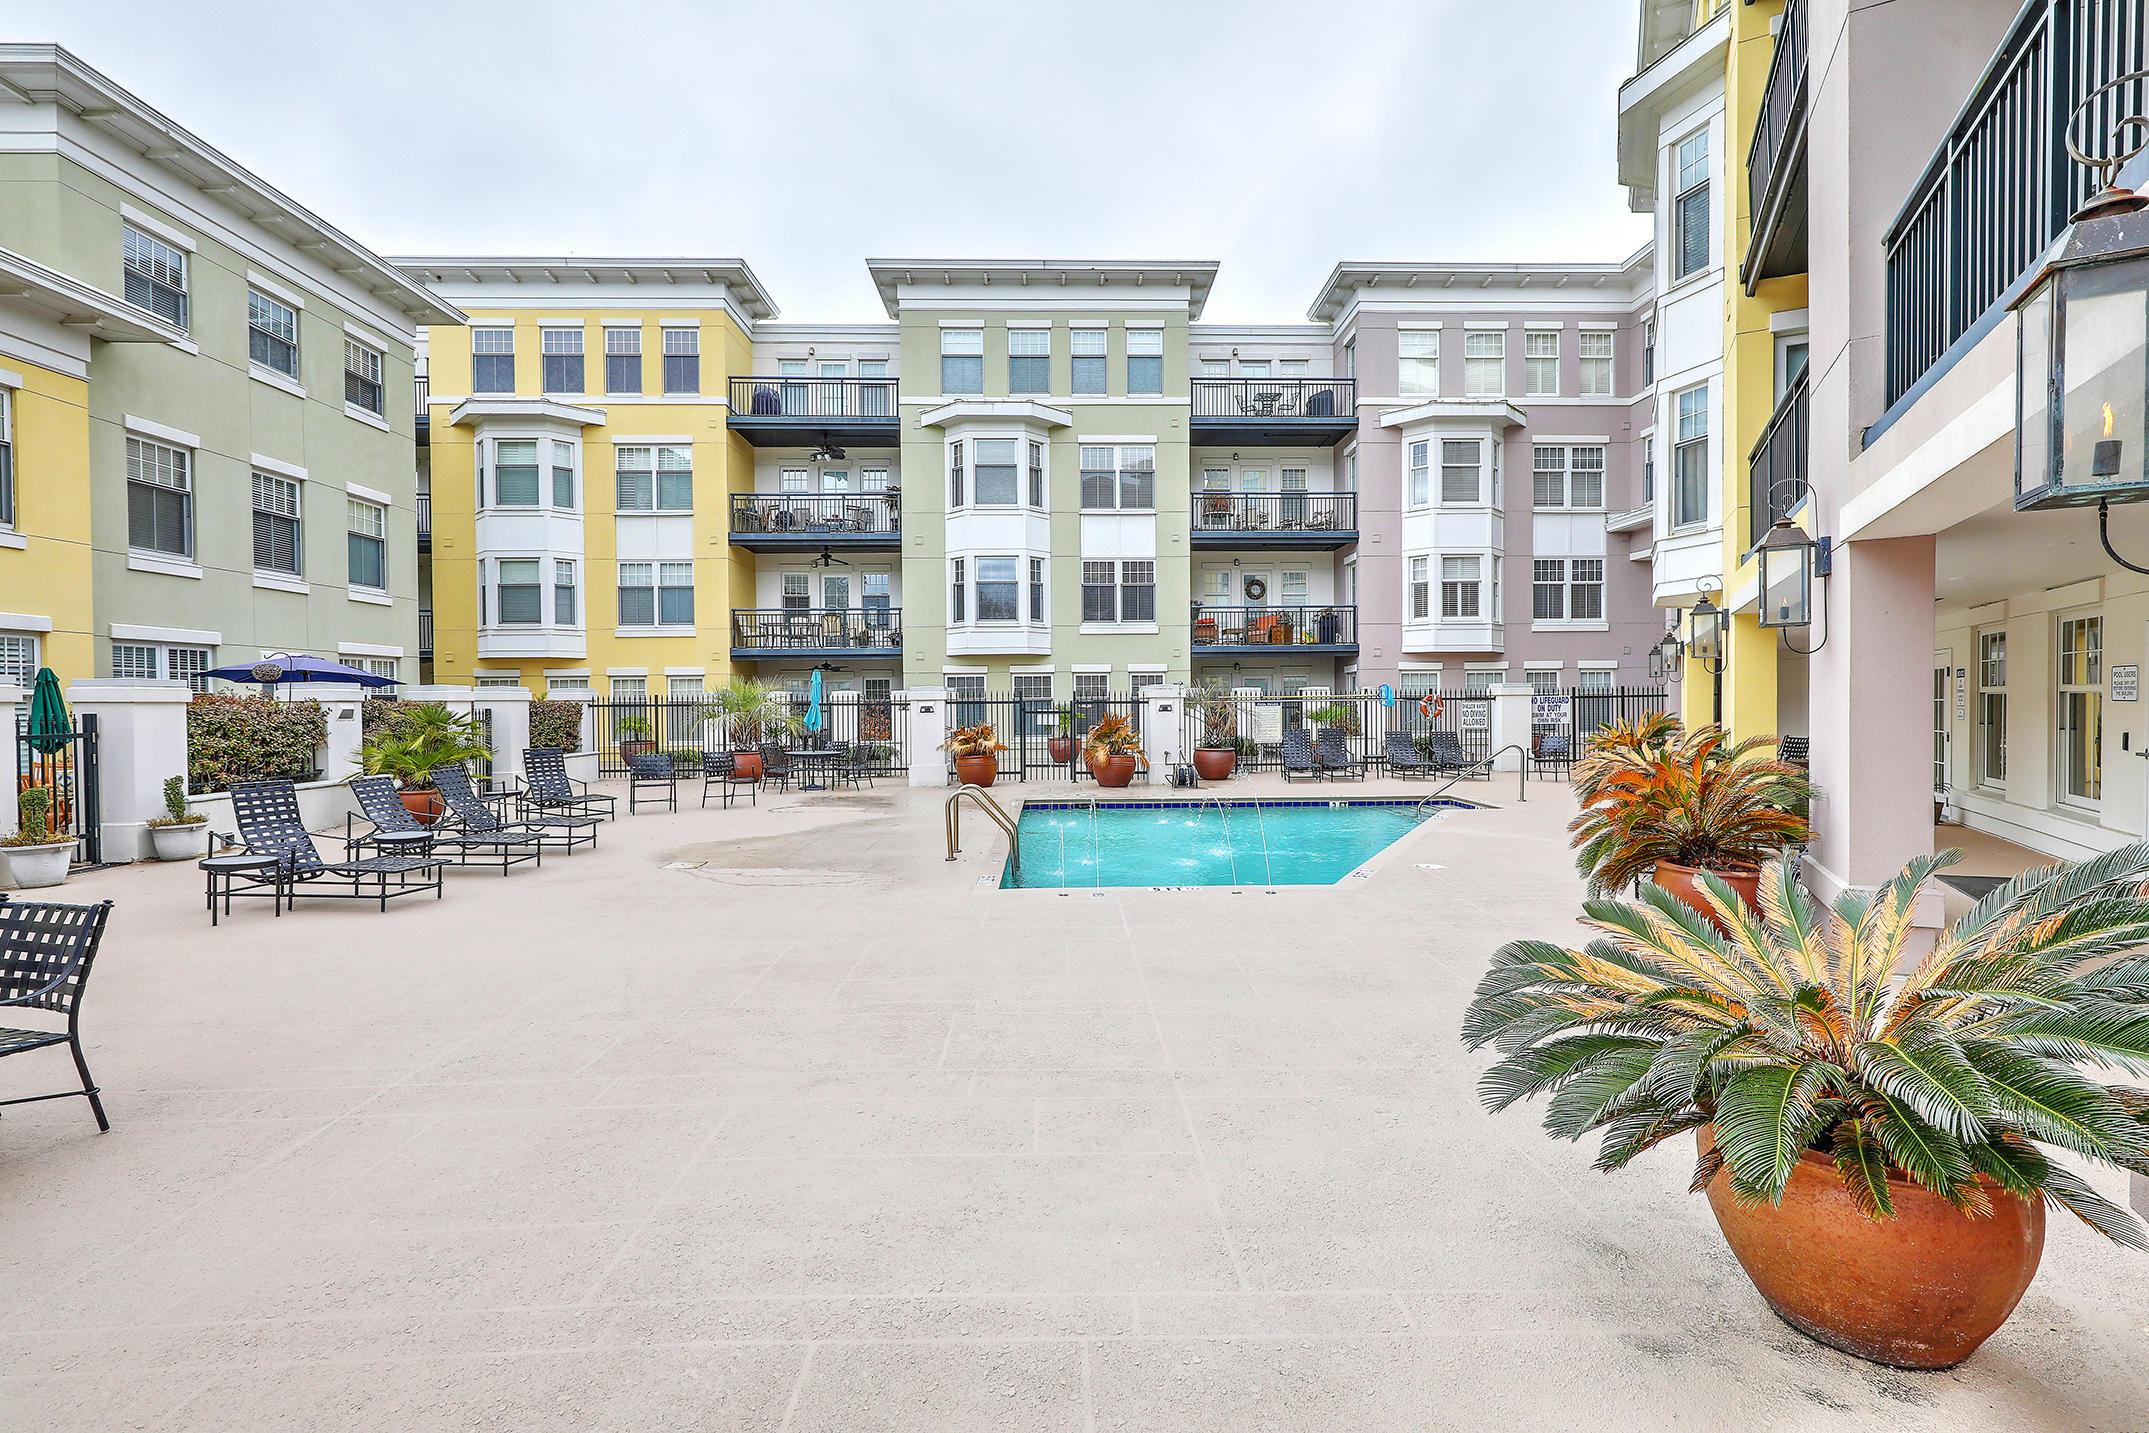 Albemarle Condos For Sale - 498 Albemarle, Charleston, SC - 31